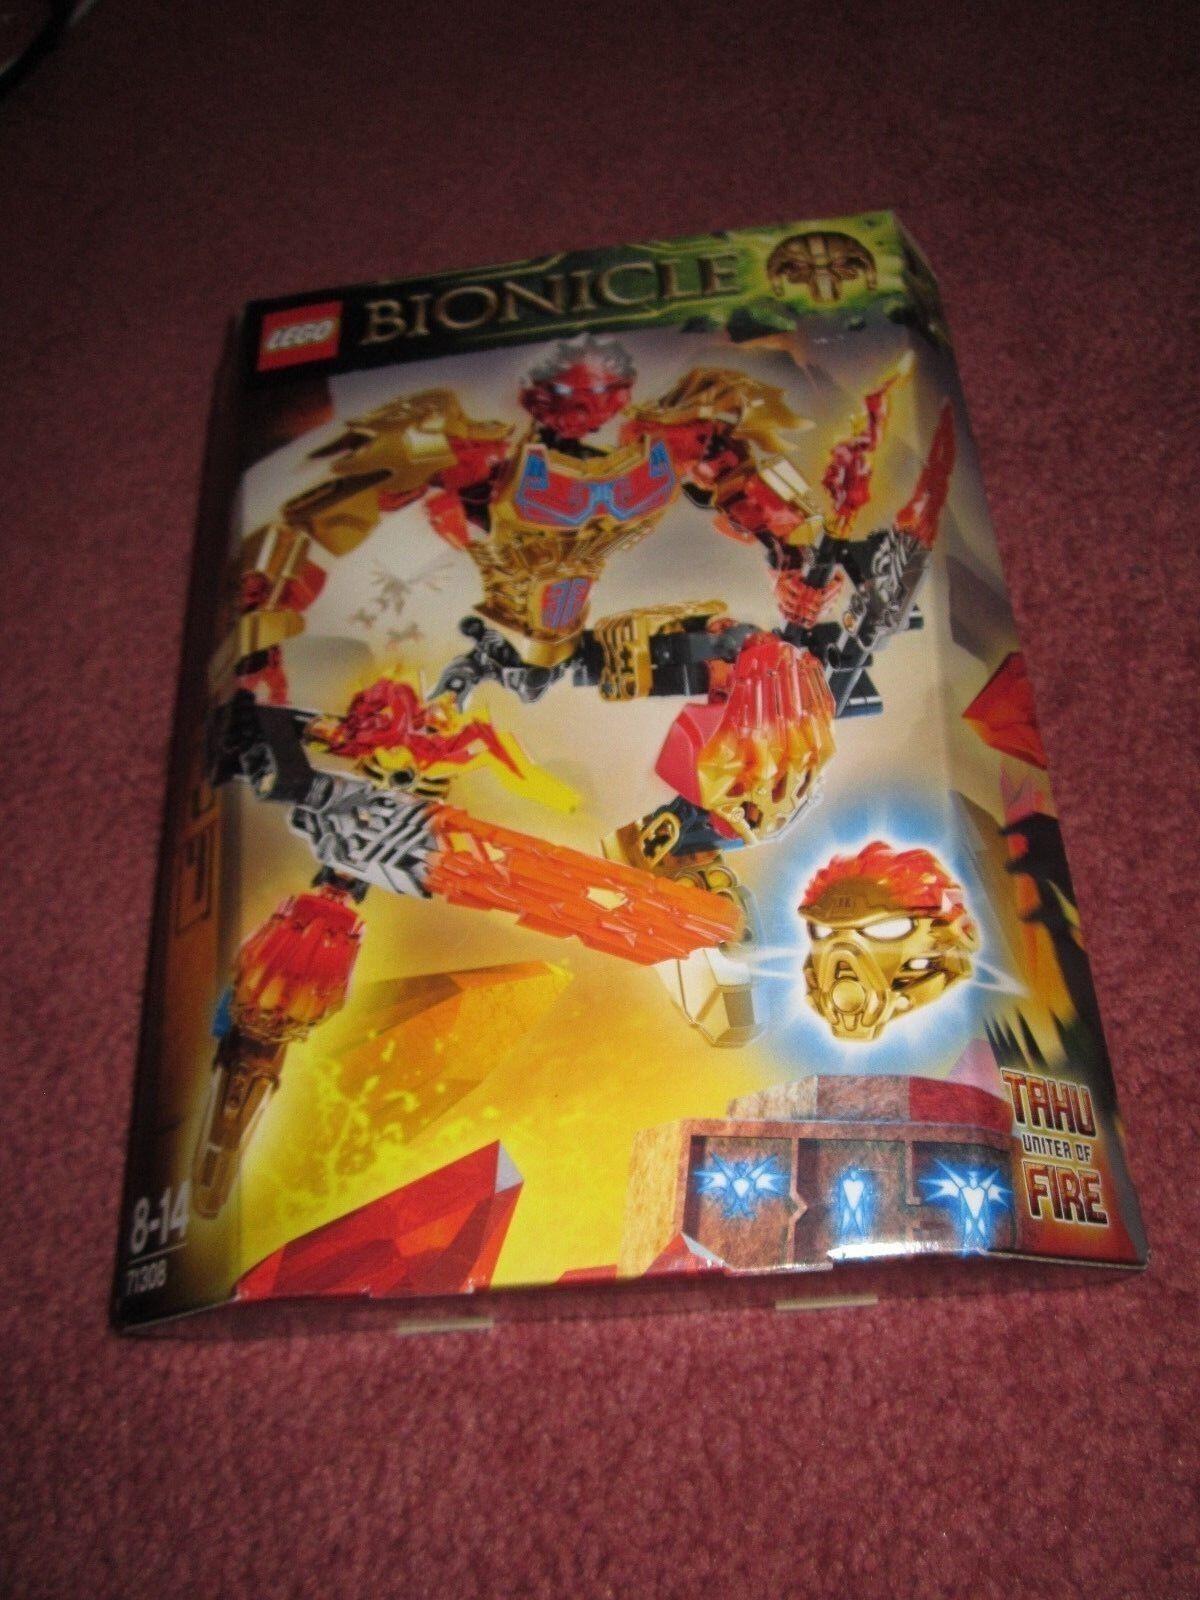 LEGO BIONICLE TAHU UNITER OF FIRE 71308 - NEW BOXED SEALED